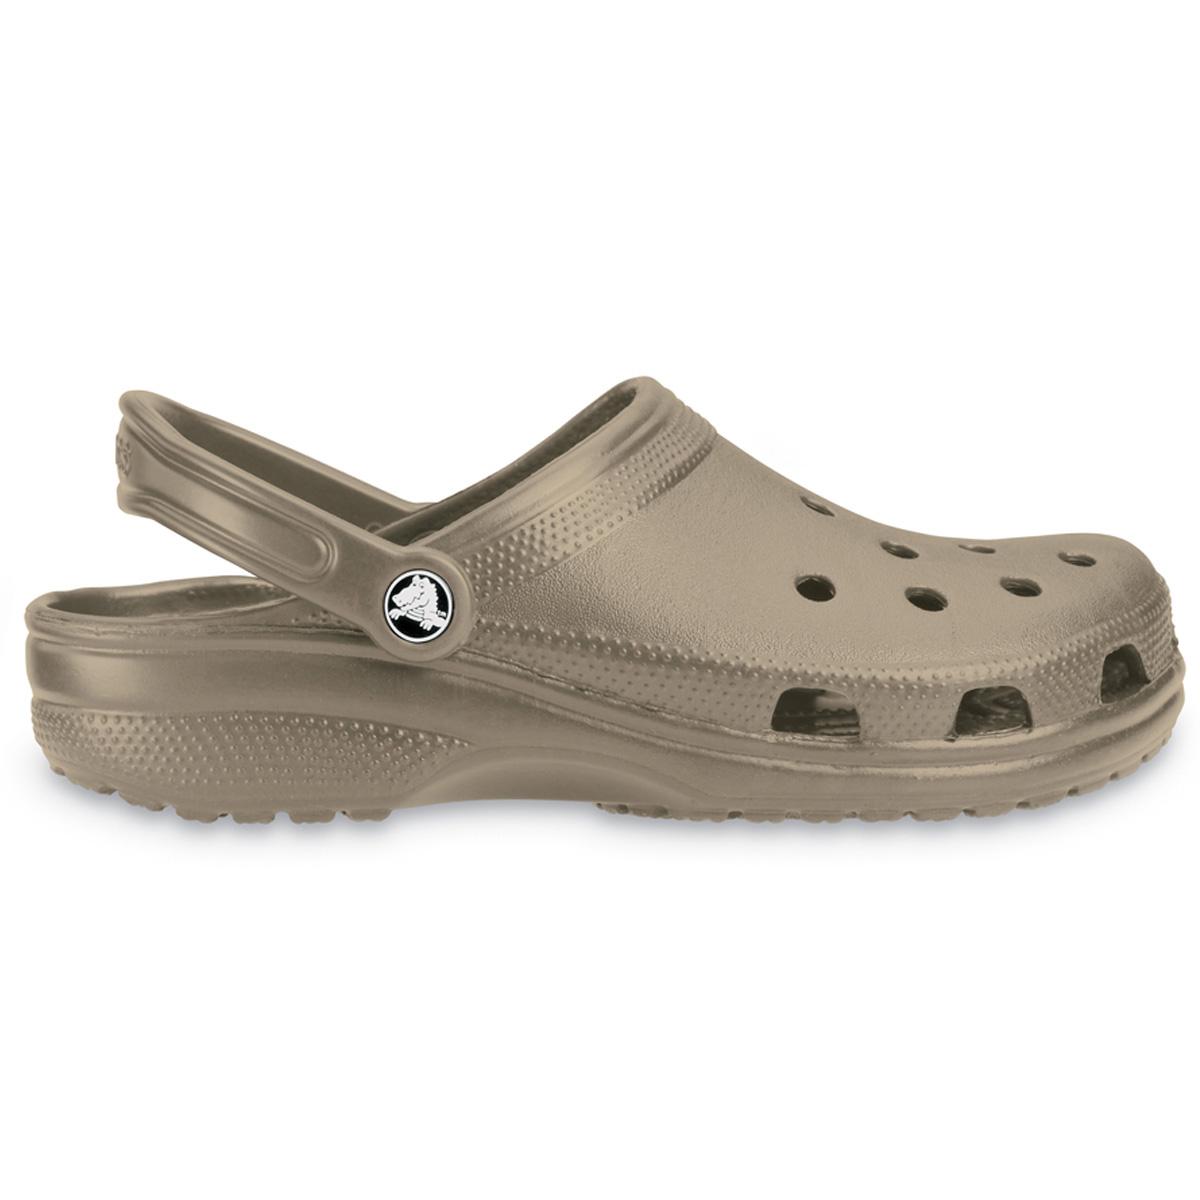 Crocs Classic - Haki